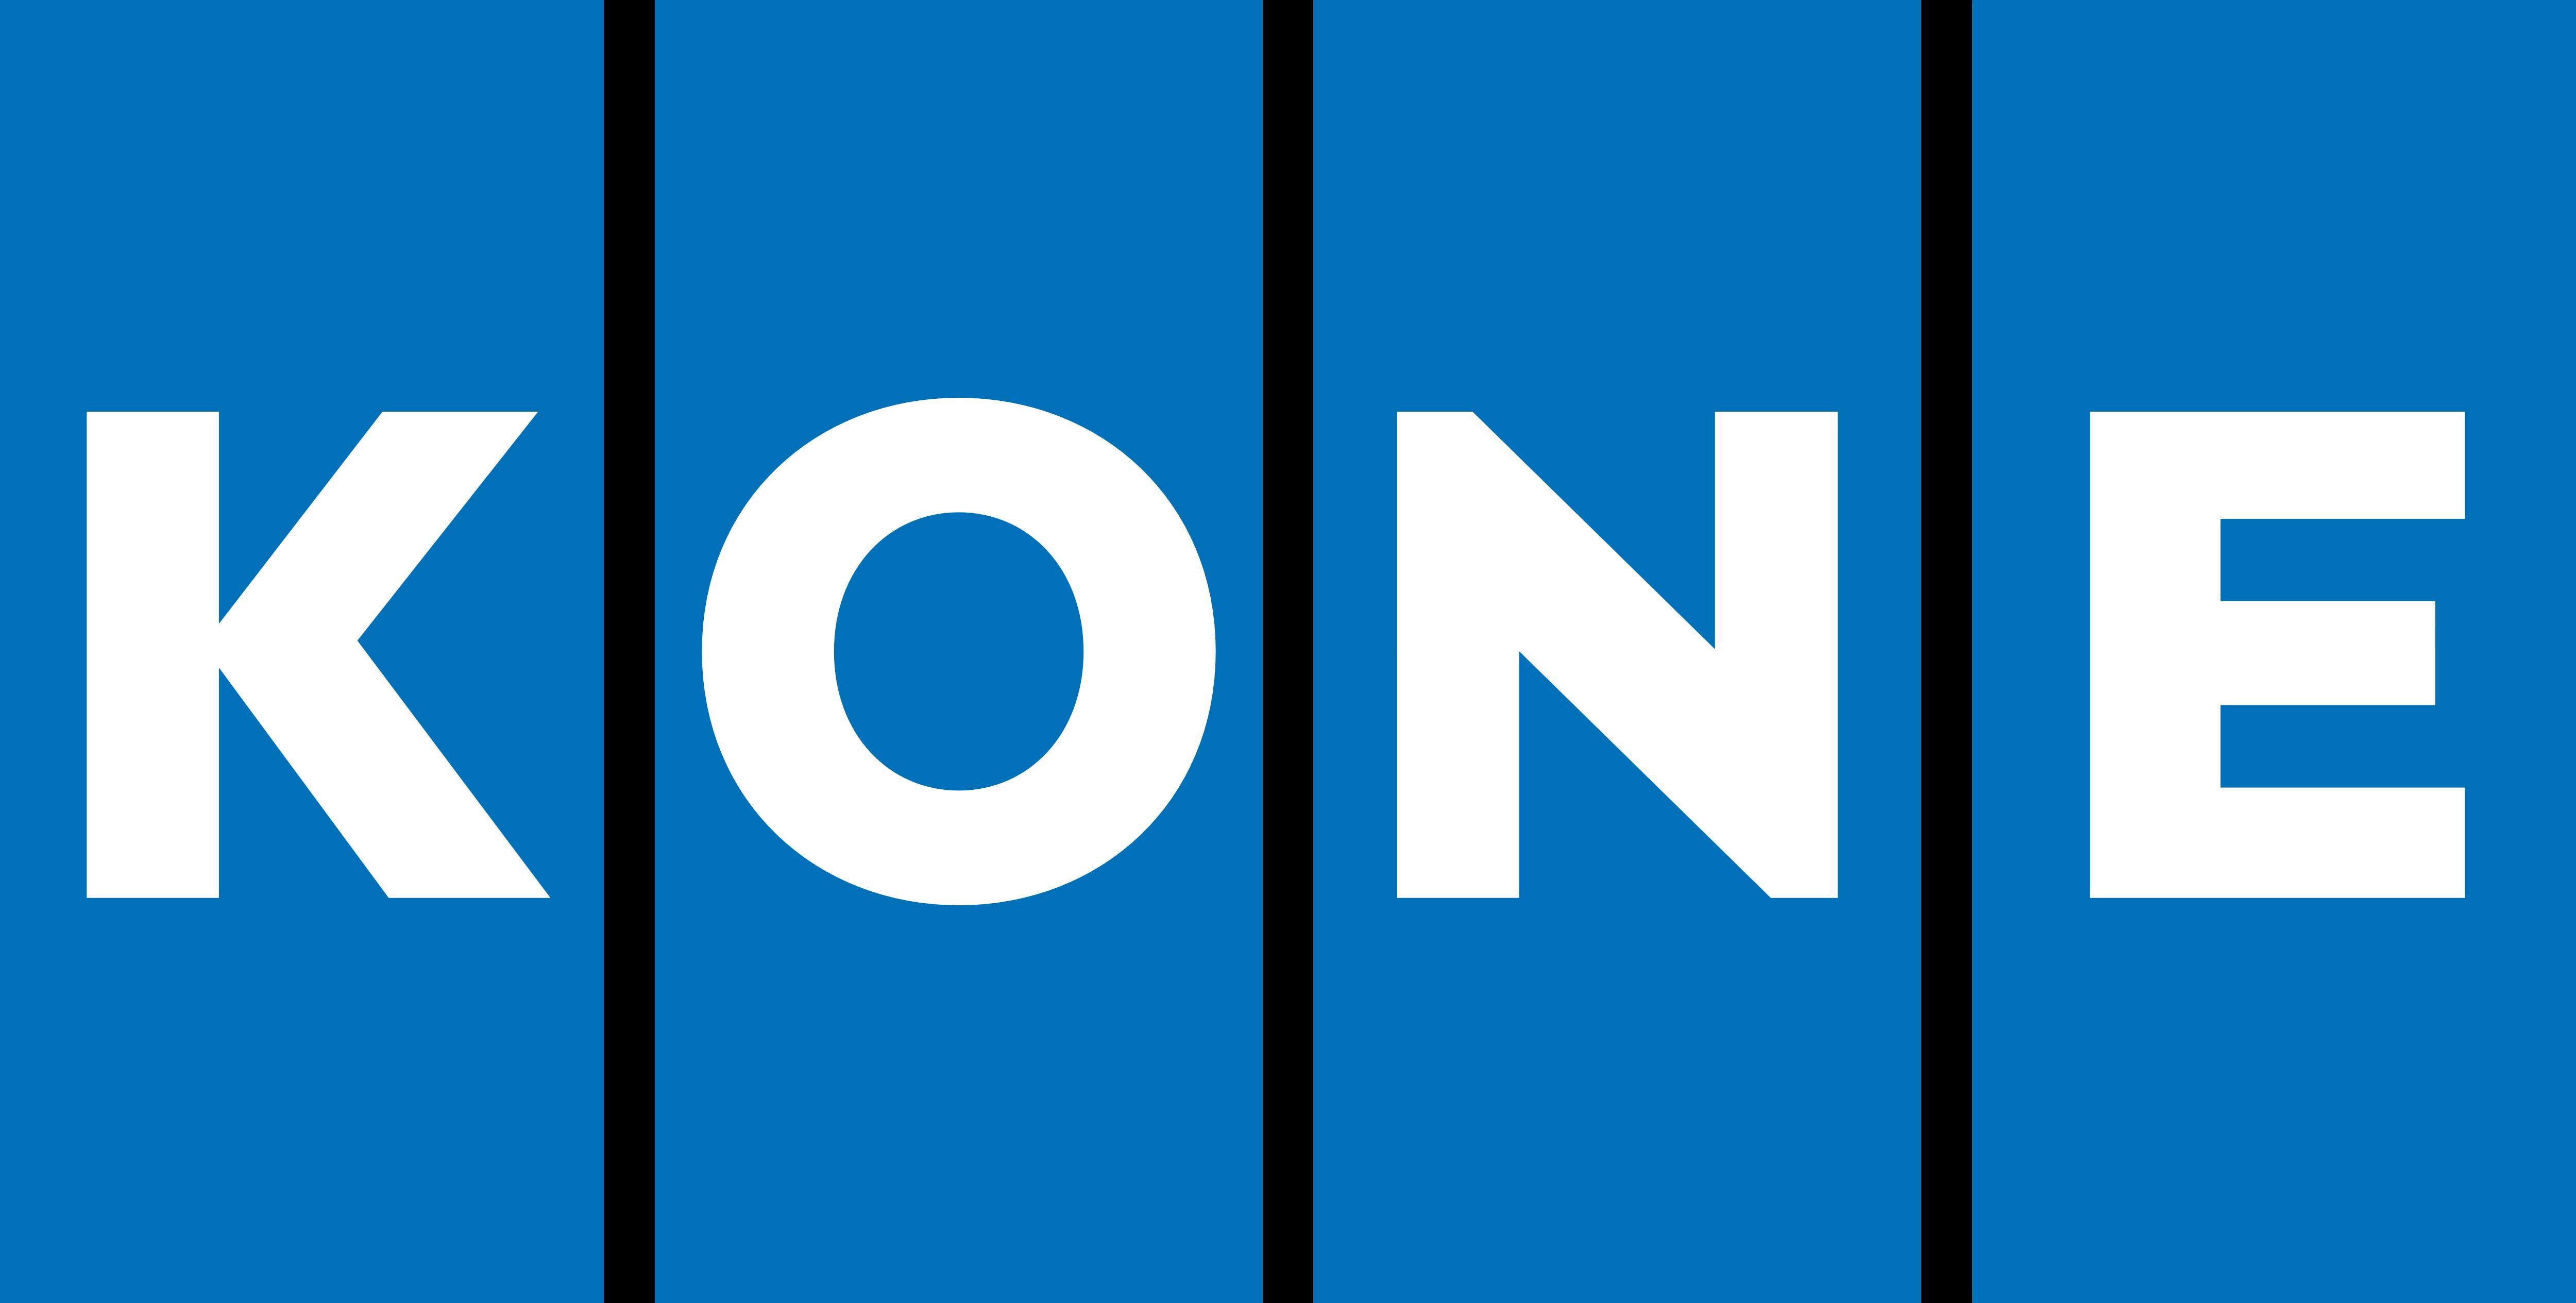 Link to external partner website kone.com